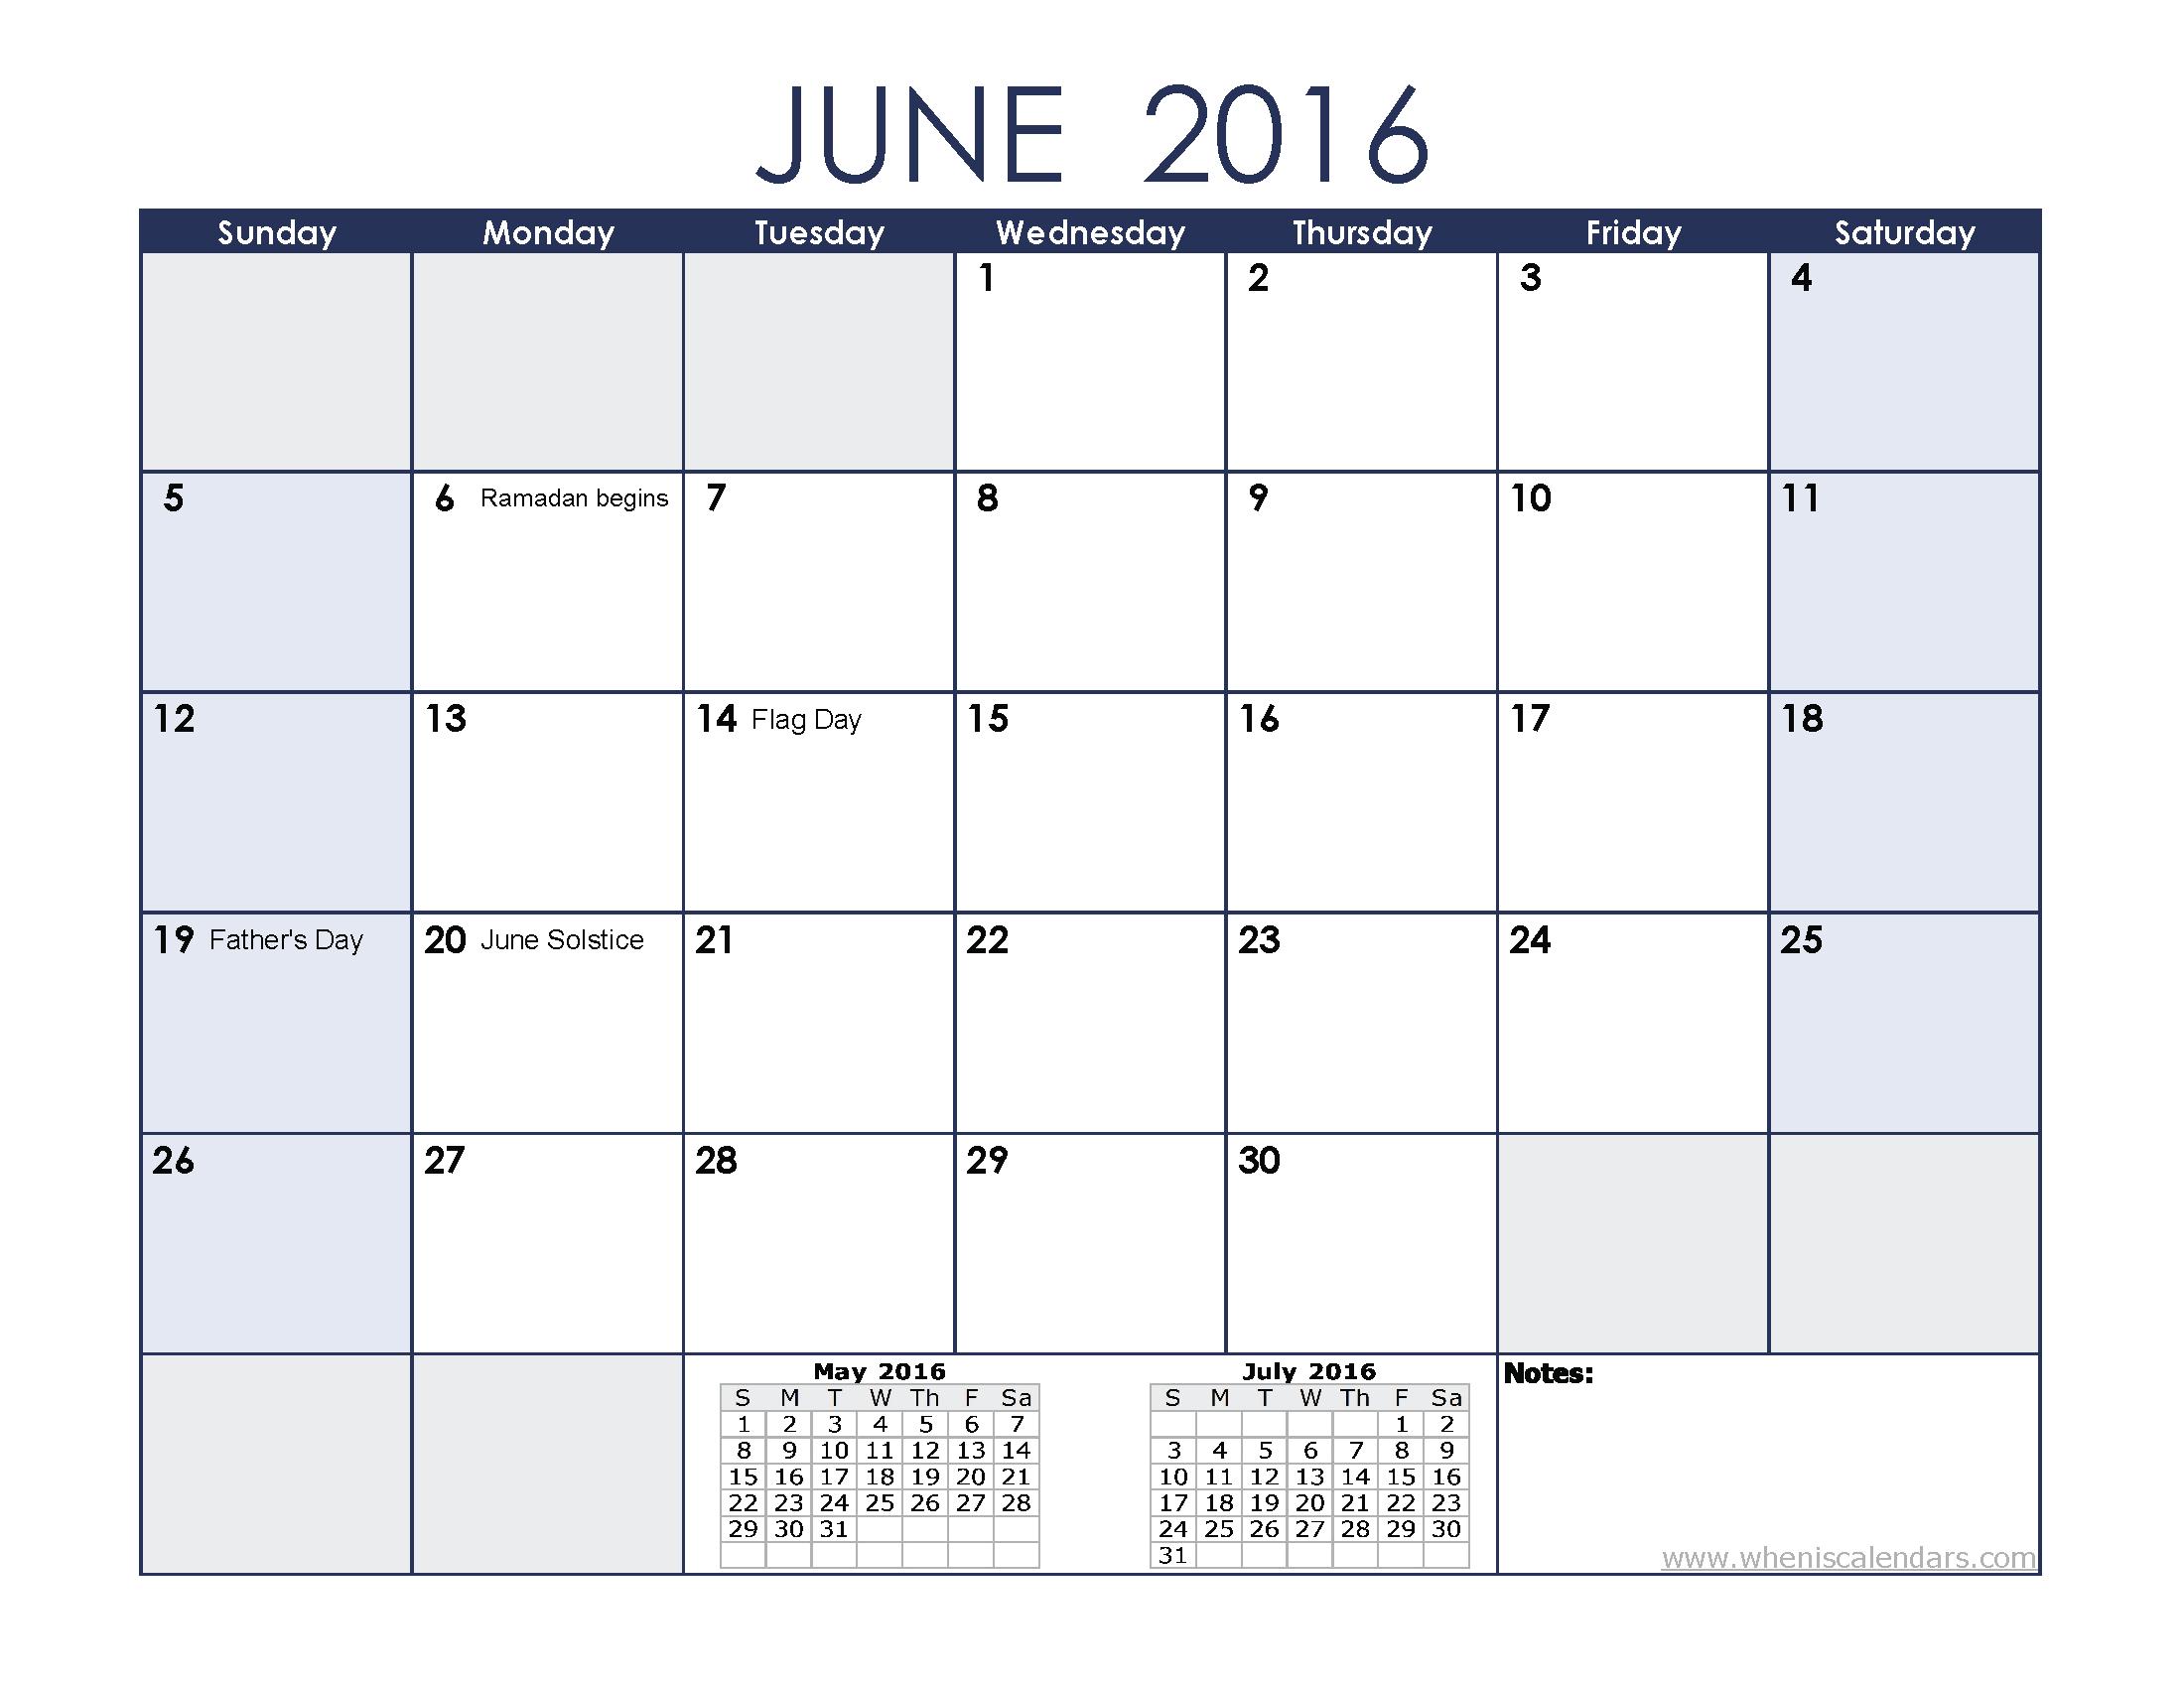 Blank june calendar clipart image transparent June 2016 calendar clipart - ClipartFest image transparent